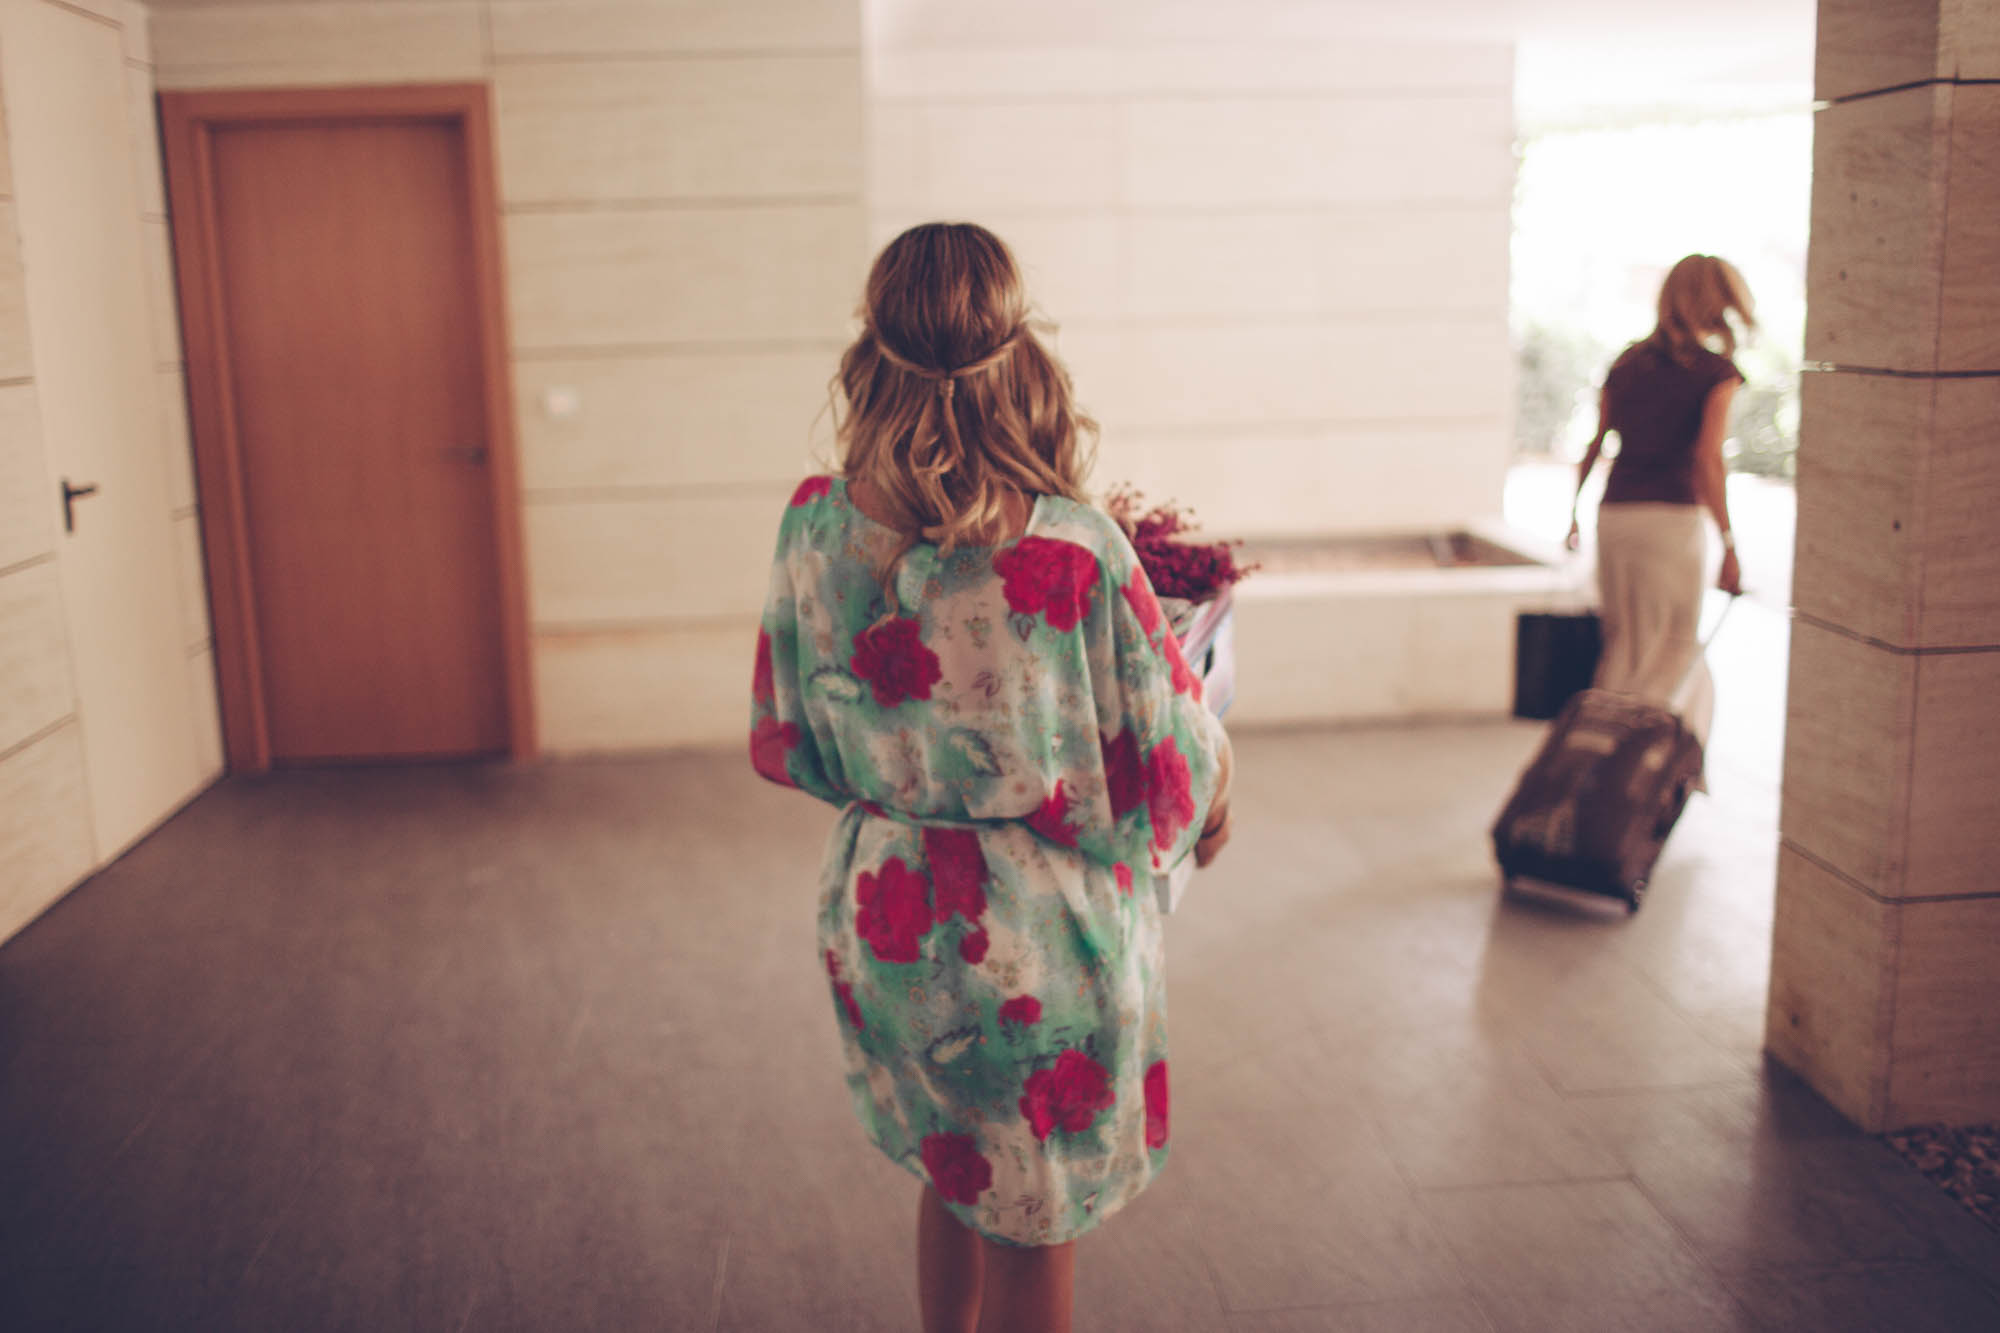 Novia de camino a sus preparativos